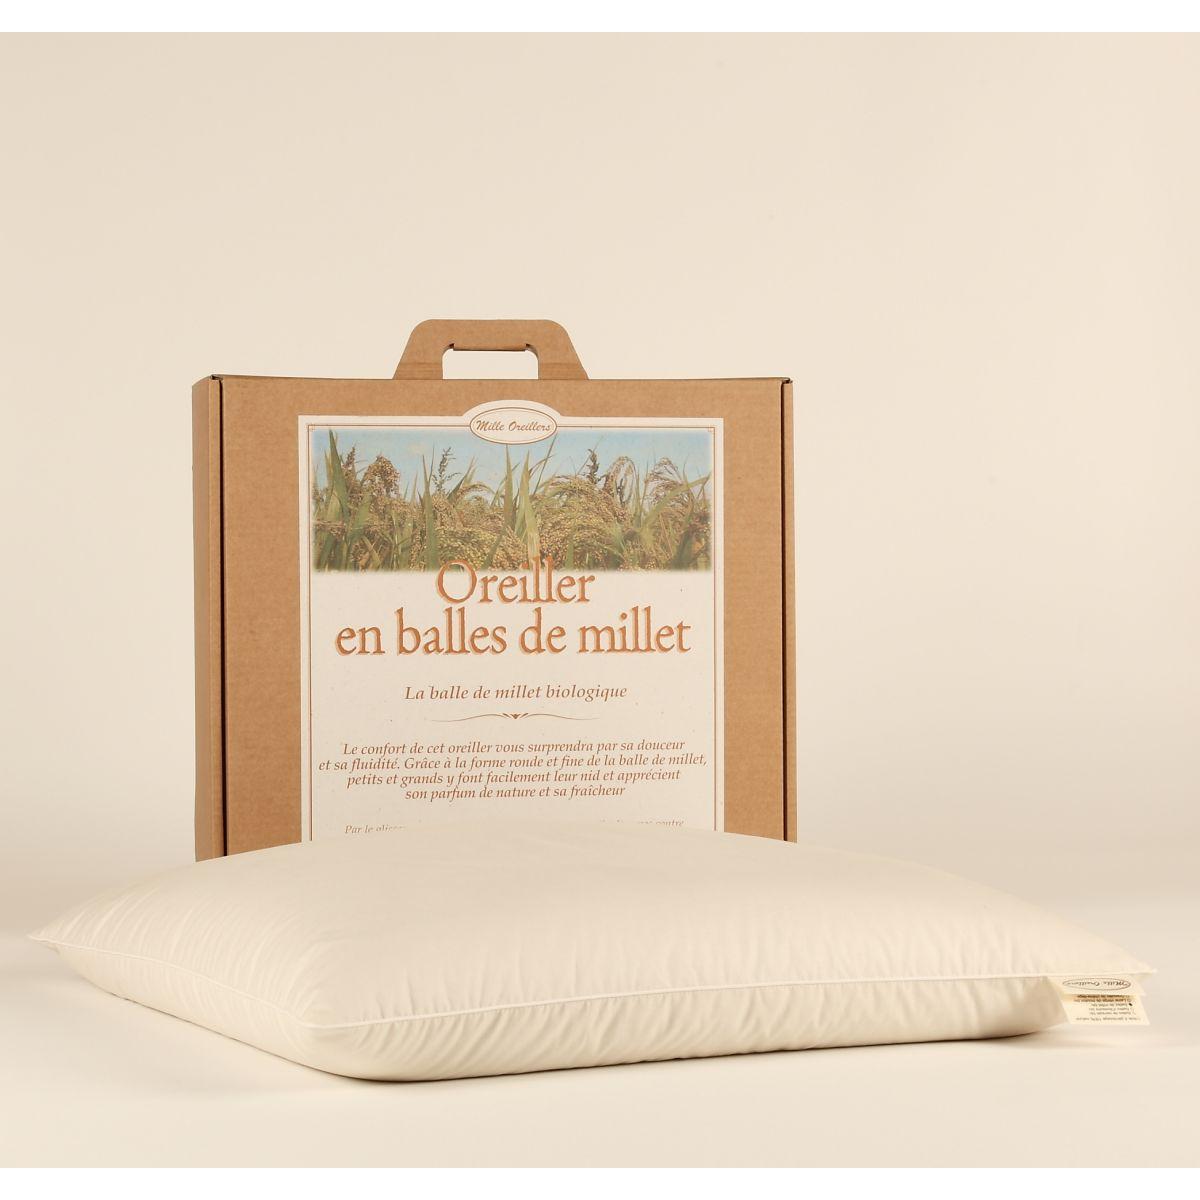 oreiller de millet 40 x 60 cm sebio. Black Bedroom Furniture Sets. Home Design Ideas